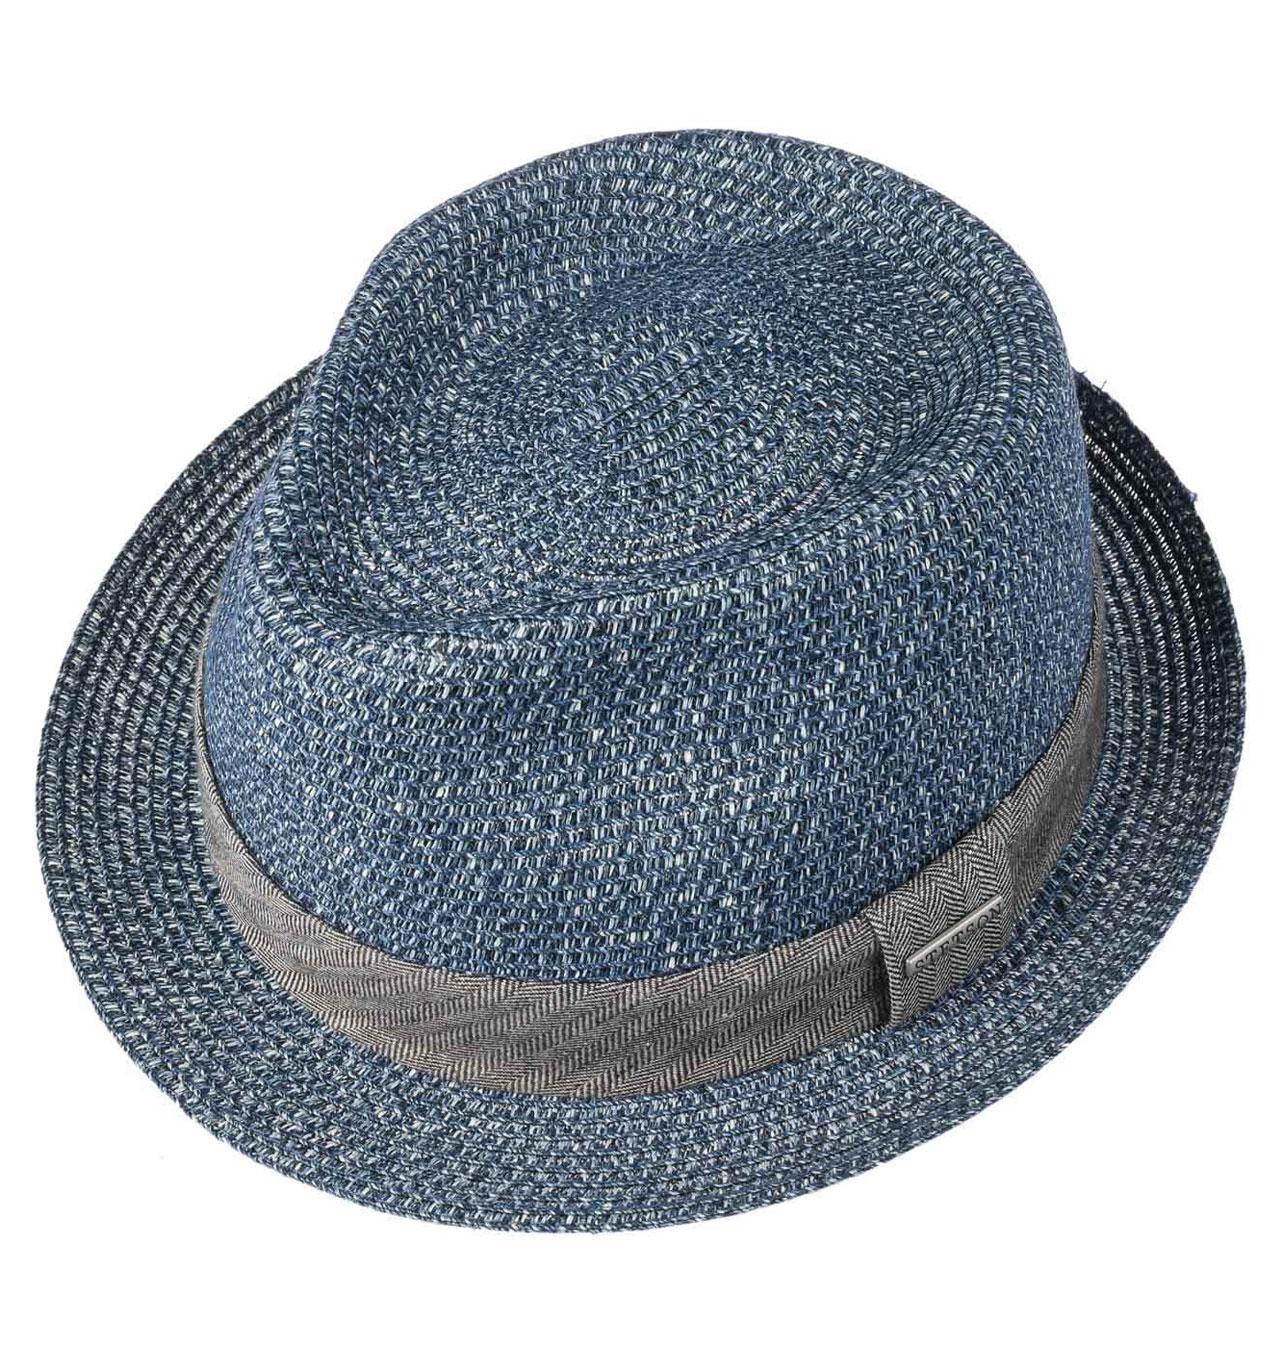 97d55de0 Stetson - Reidton Toyo Trilby Straw Hat - Blue